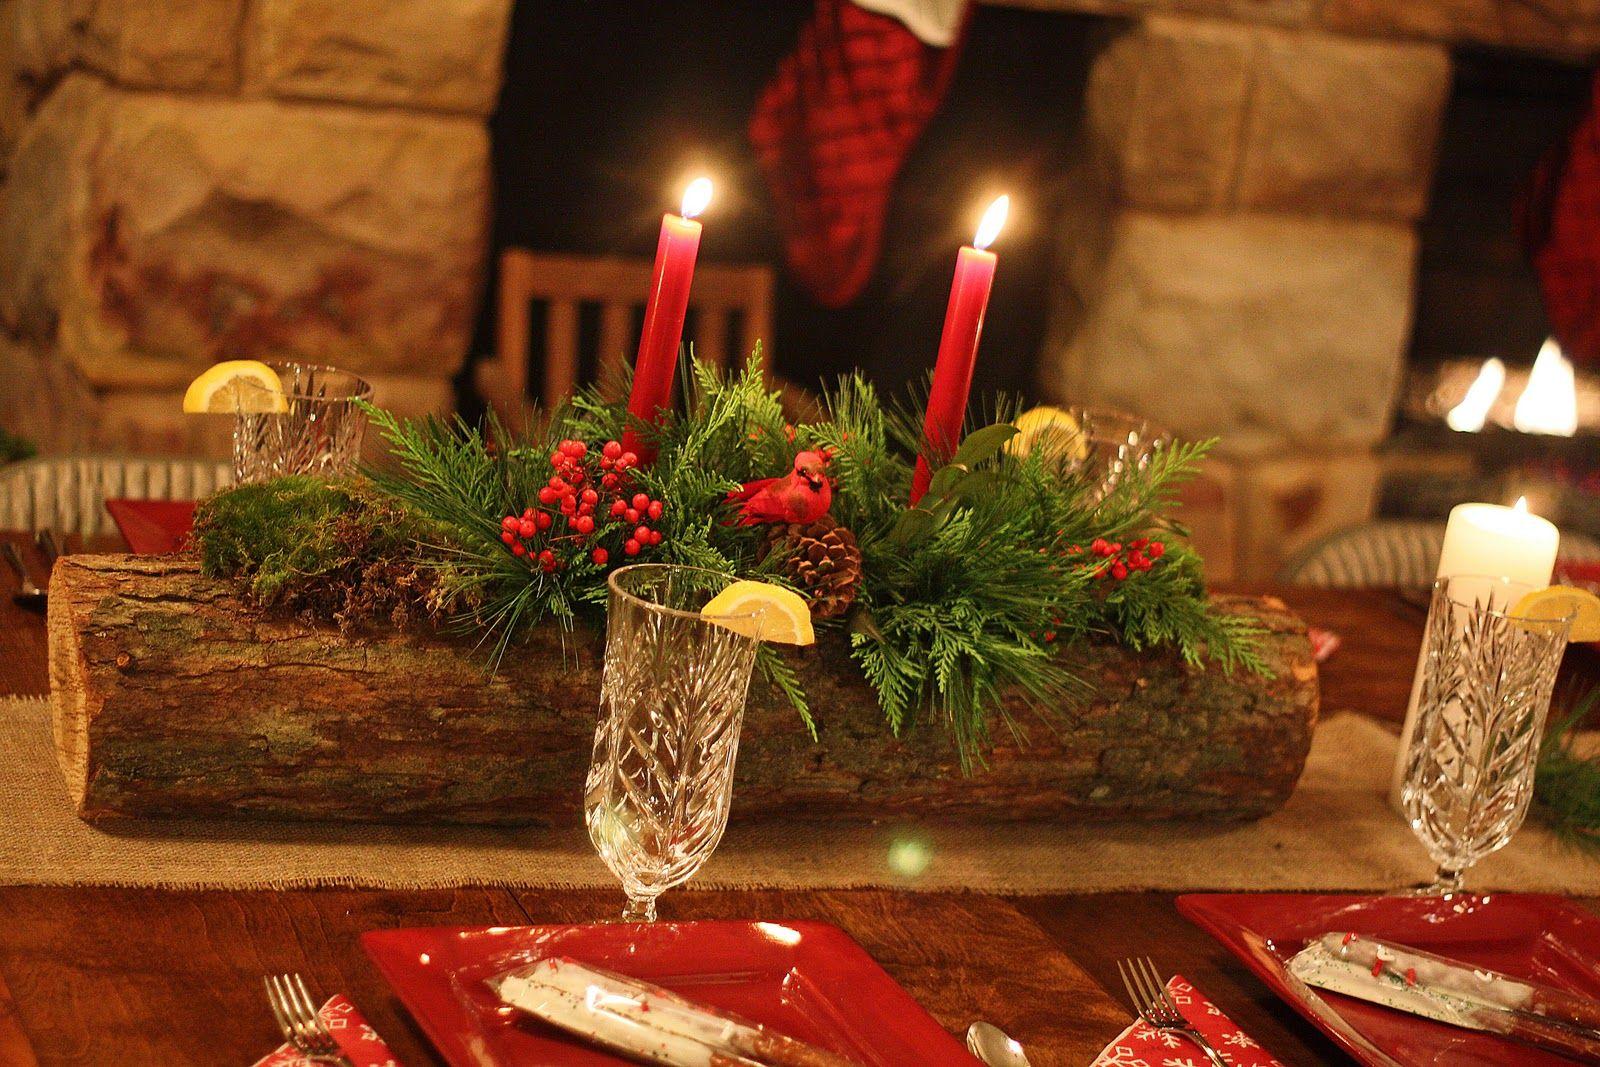 Christmas Centerpiece Christmas Table Centerpieces Beautiful Christmas Decorations Christmas Dining Table